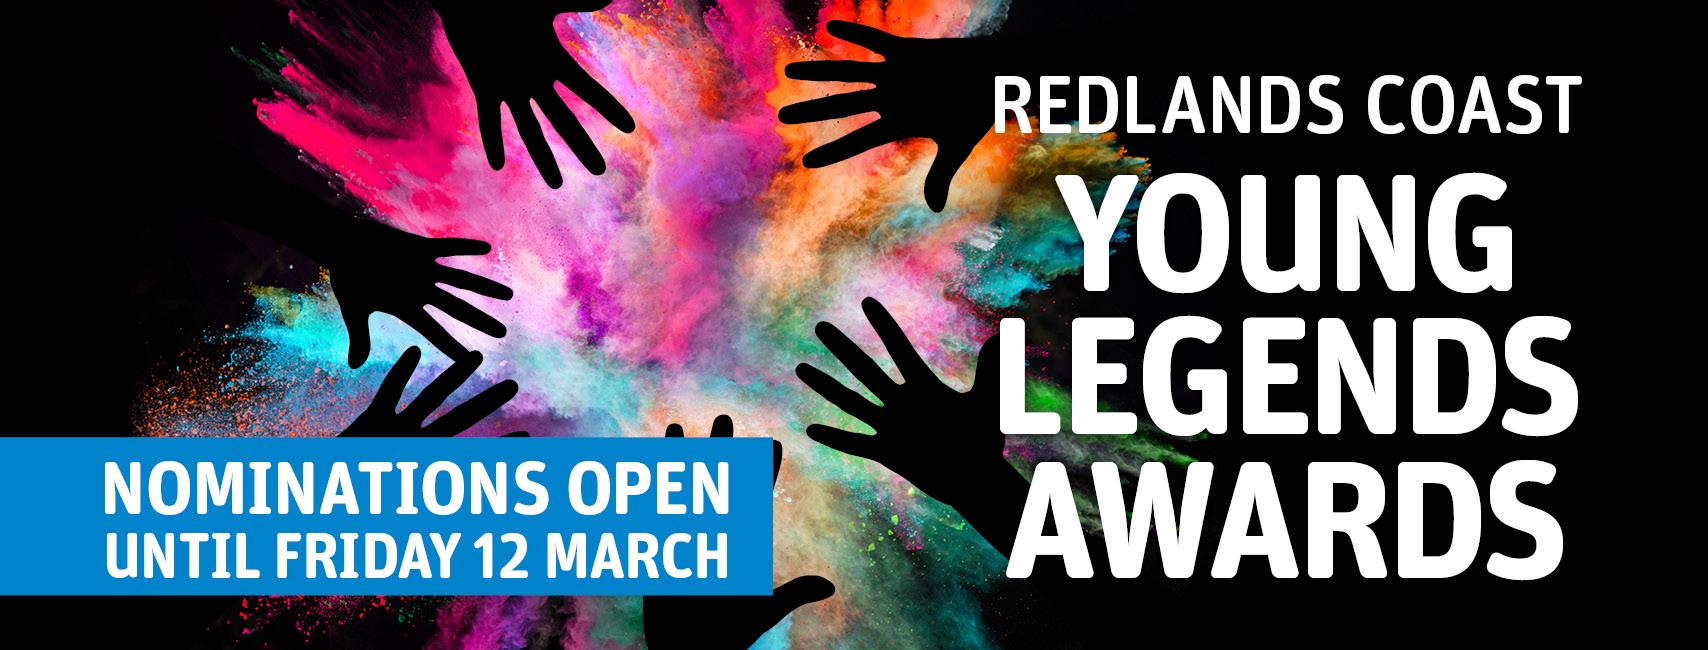 Redlands coast young legends awards